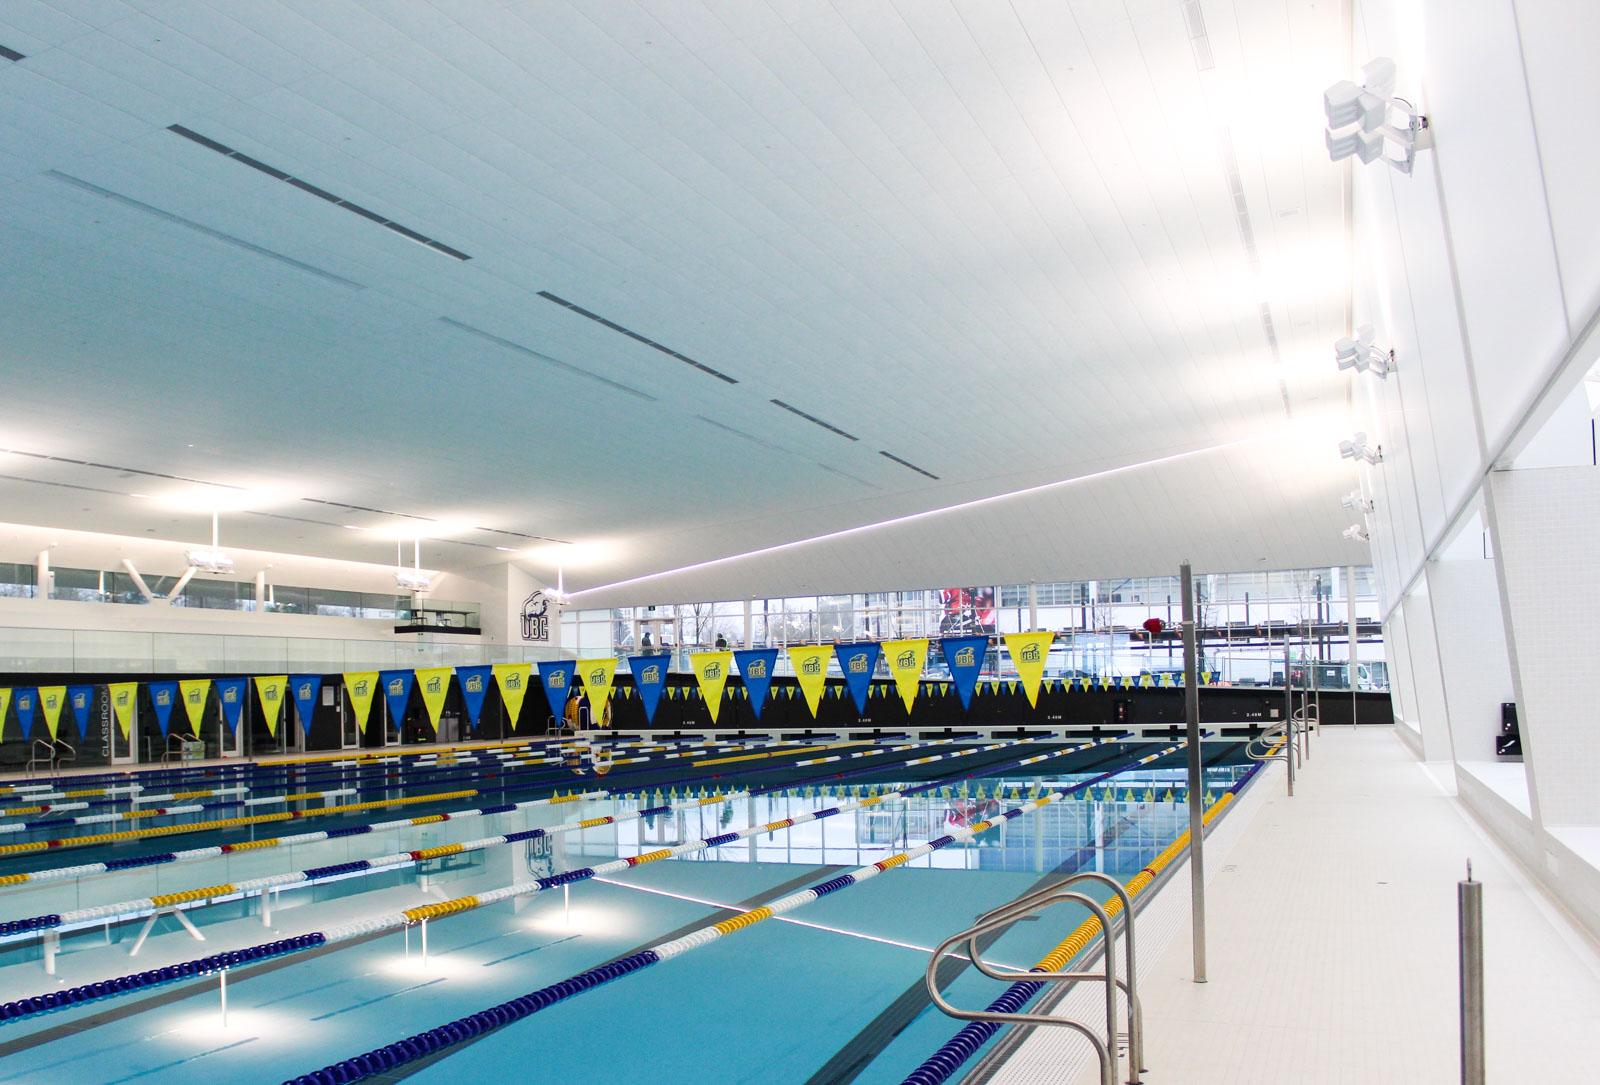 The UBC Aquatic Centre hosts daily public swims.